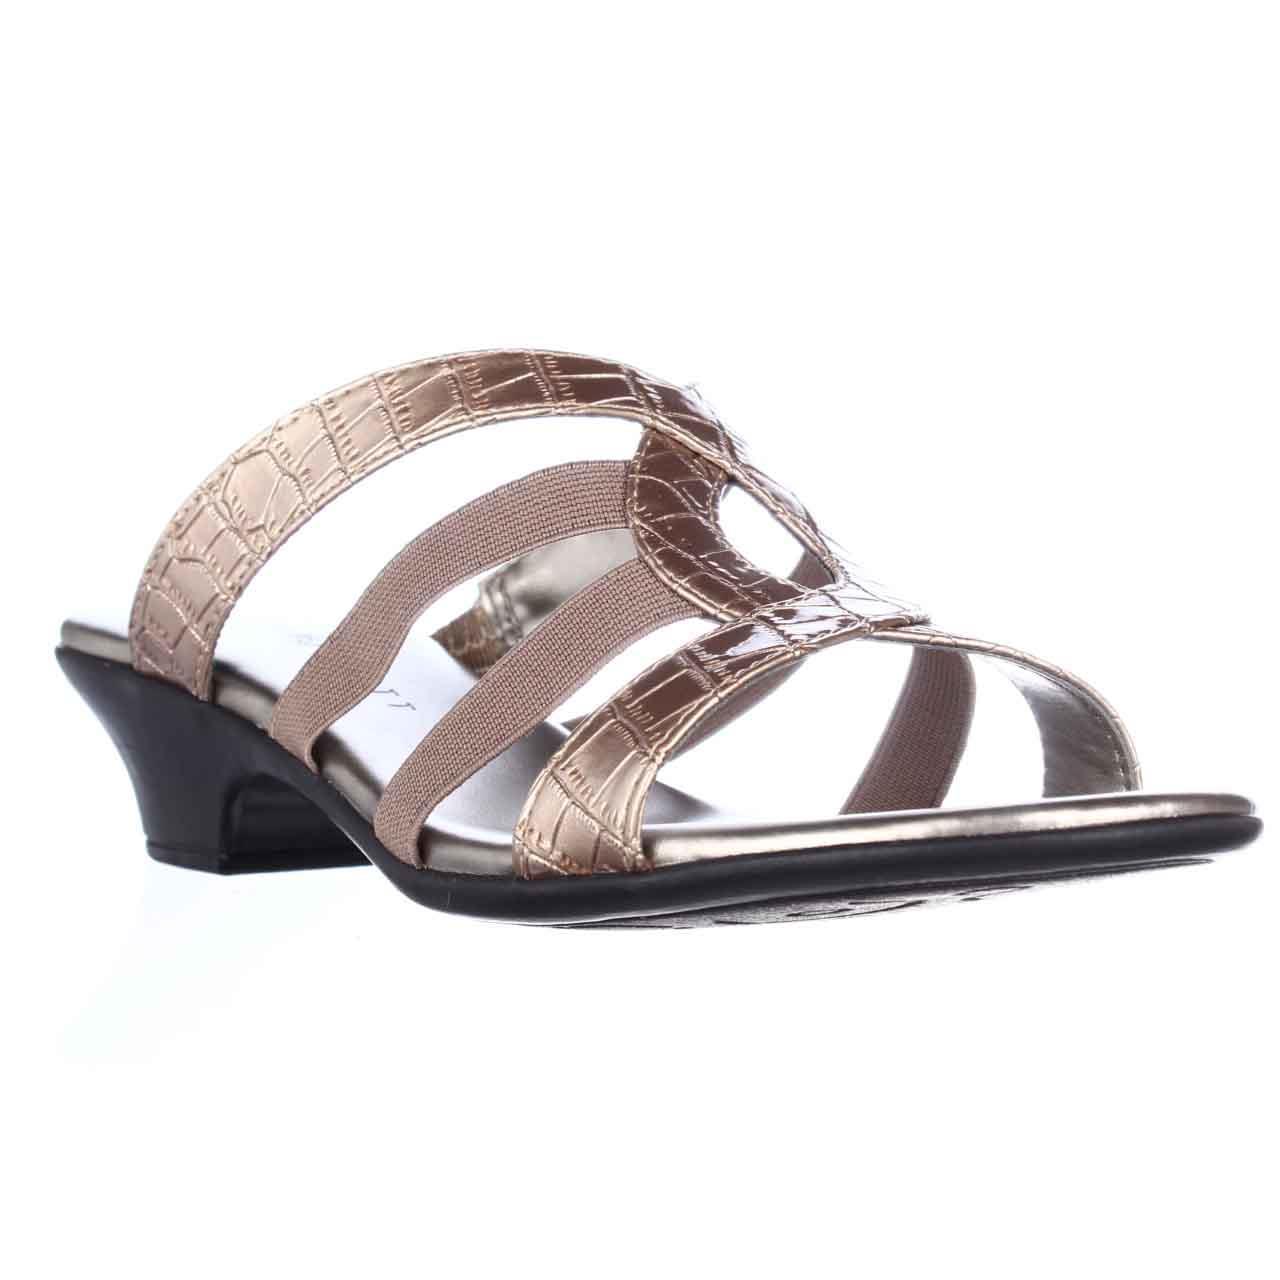 Womens Karen Scott Emet Open Toe Slide Sandals - Mocha